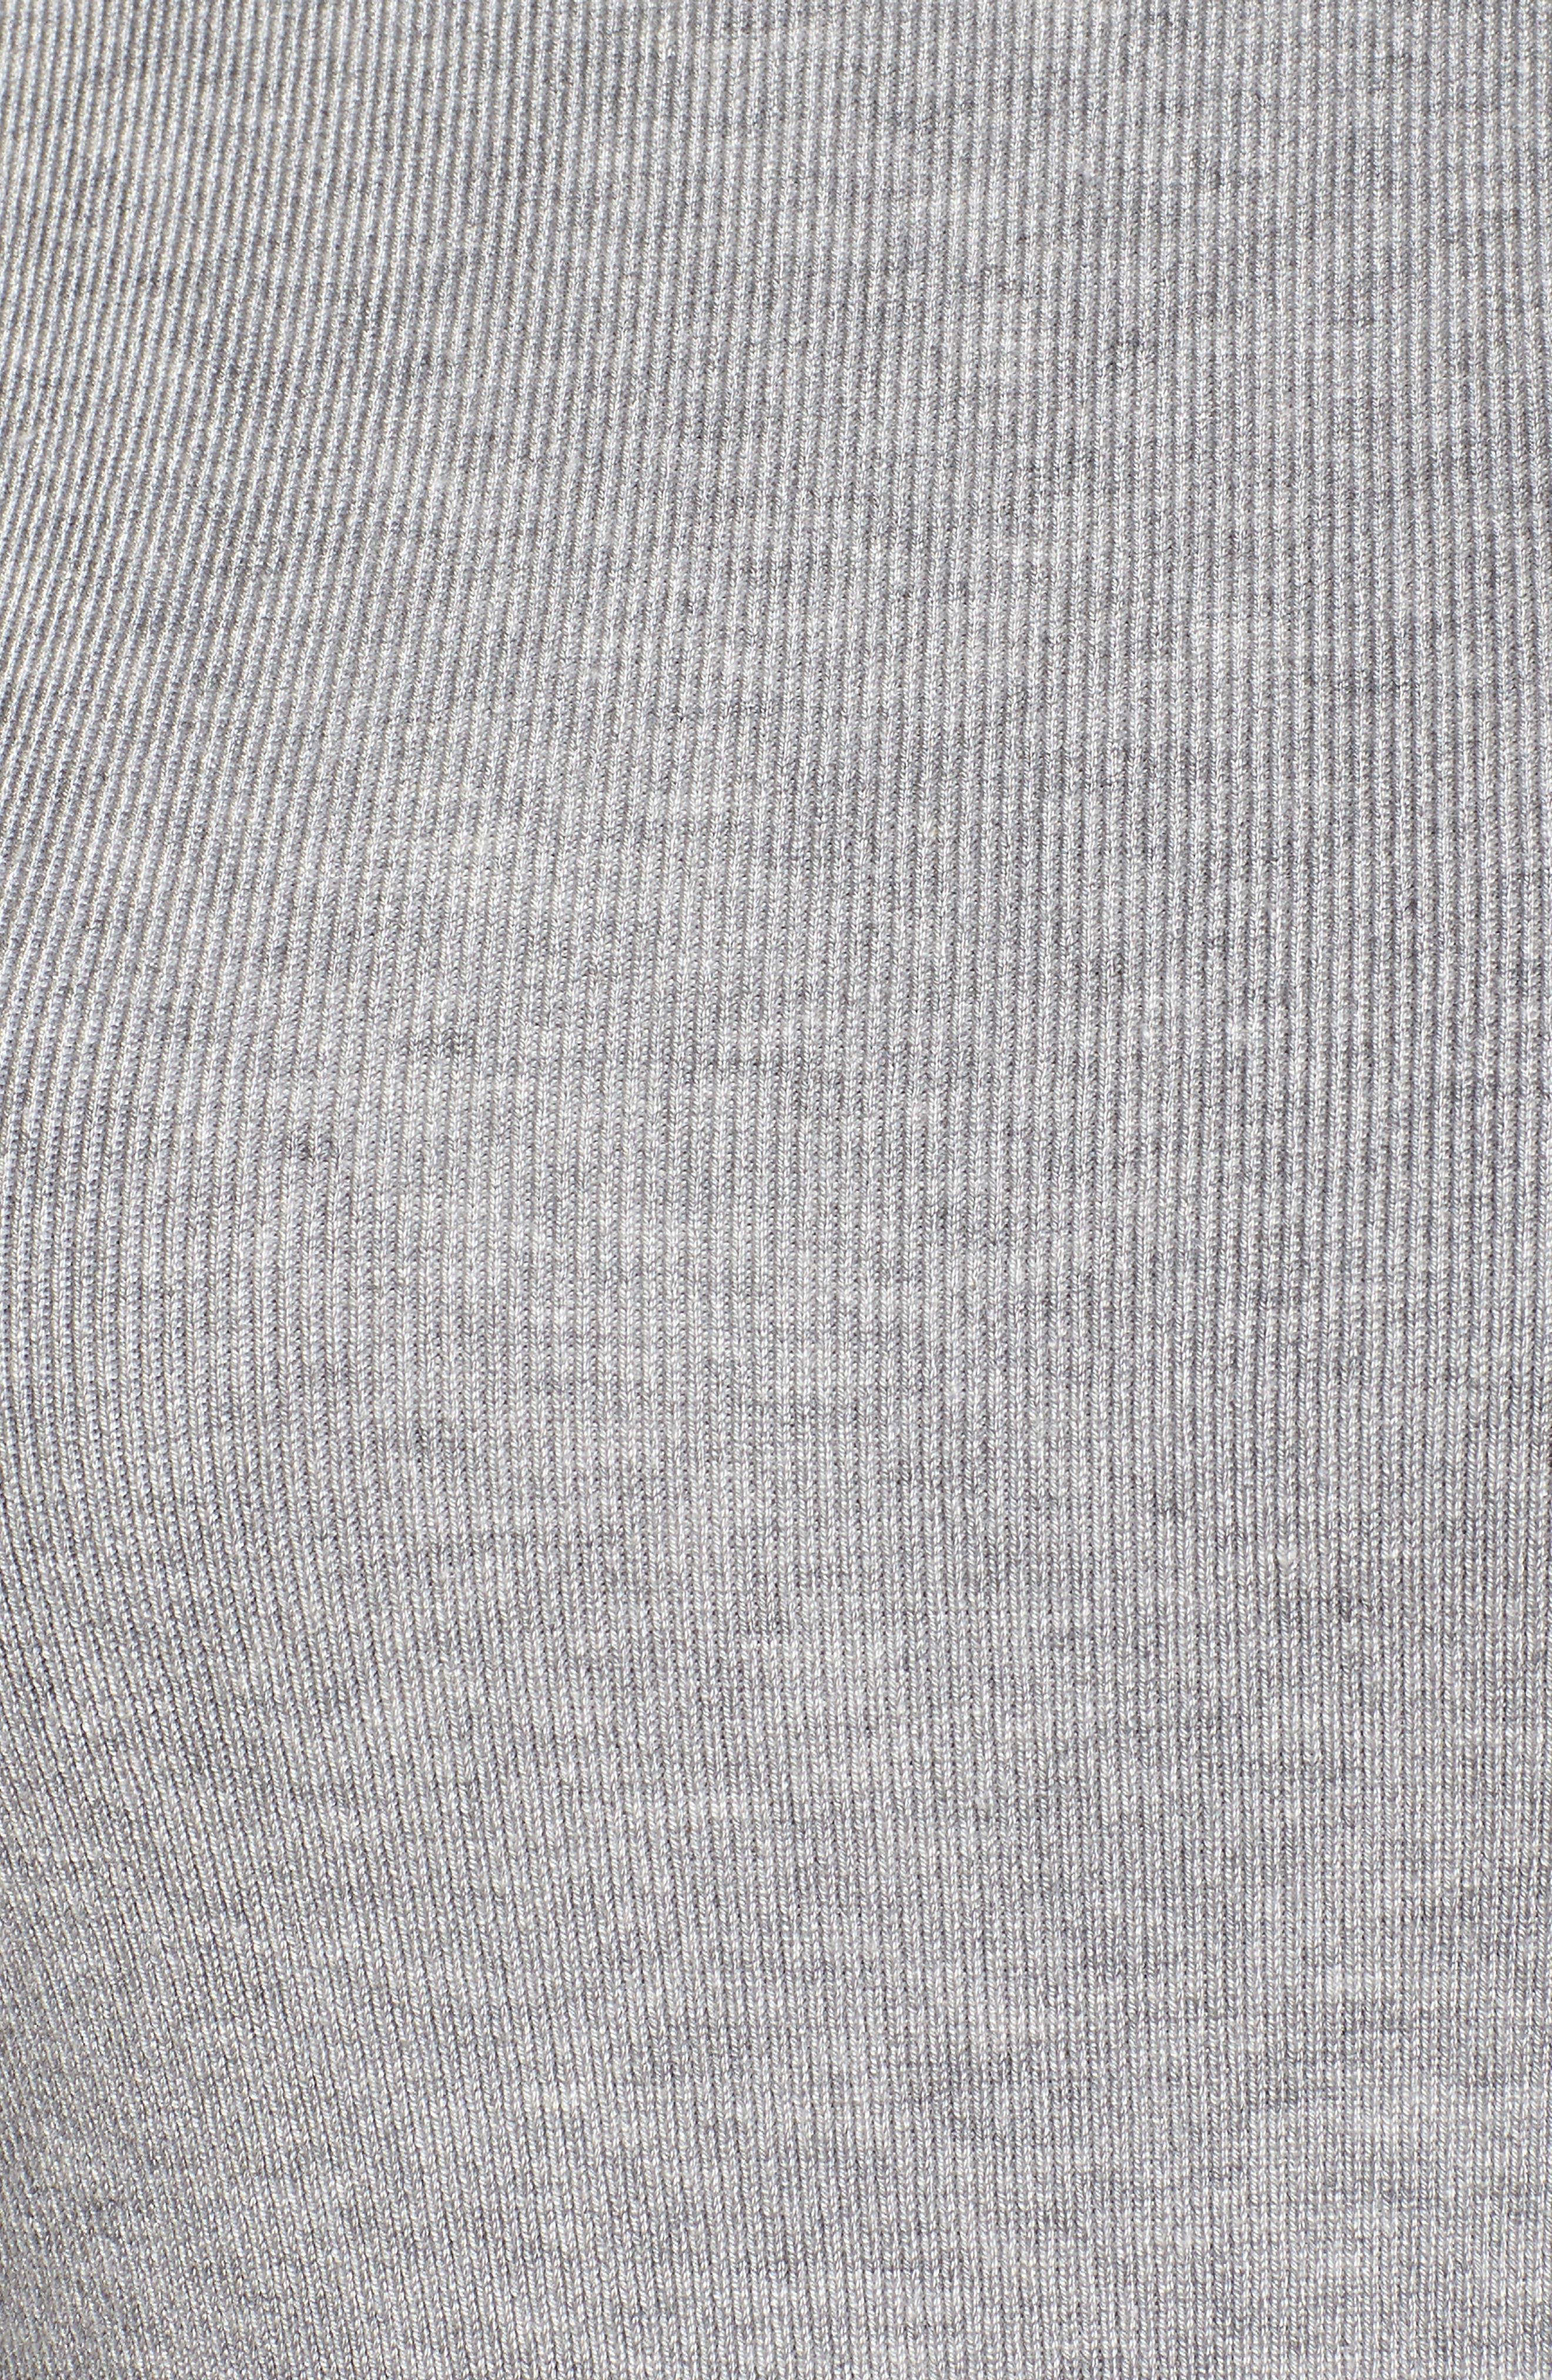 Sequin Mock Neck Sweater,                             Alternate thumbnail 5, color,                             030